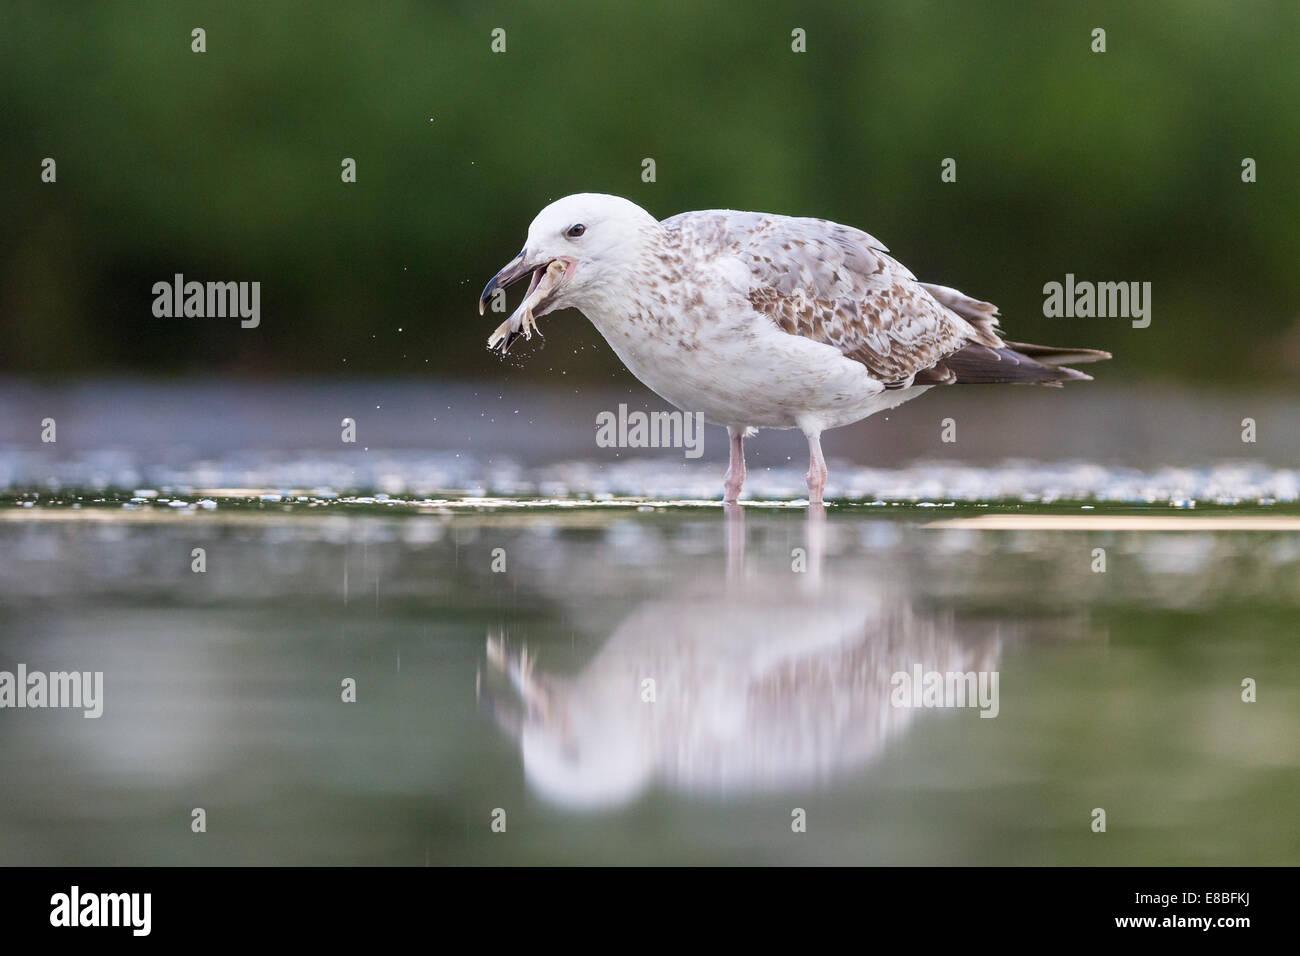 Sub-adult Yellow-legged Gull (Larus michahellis) eating a fish Stock Photo